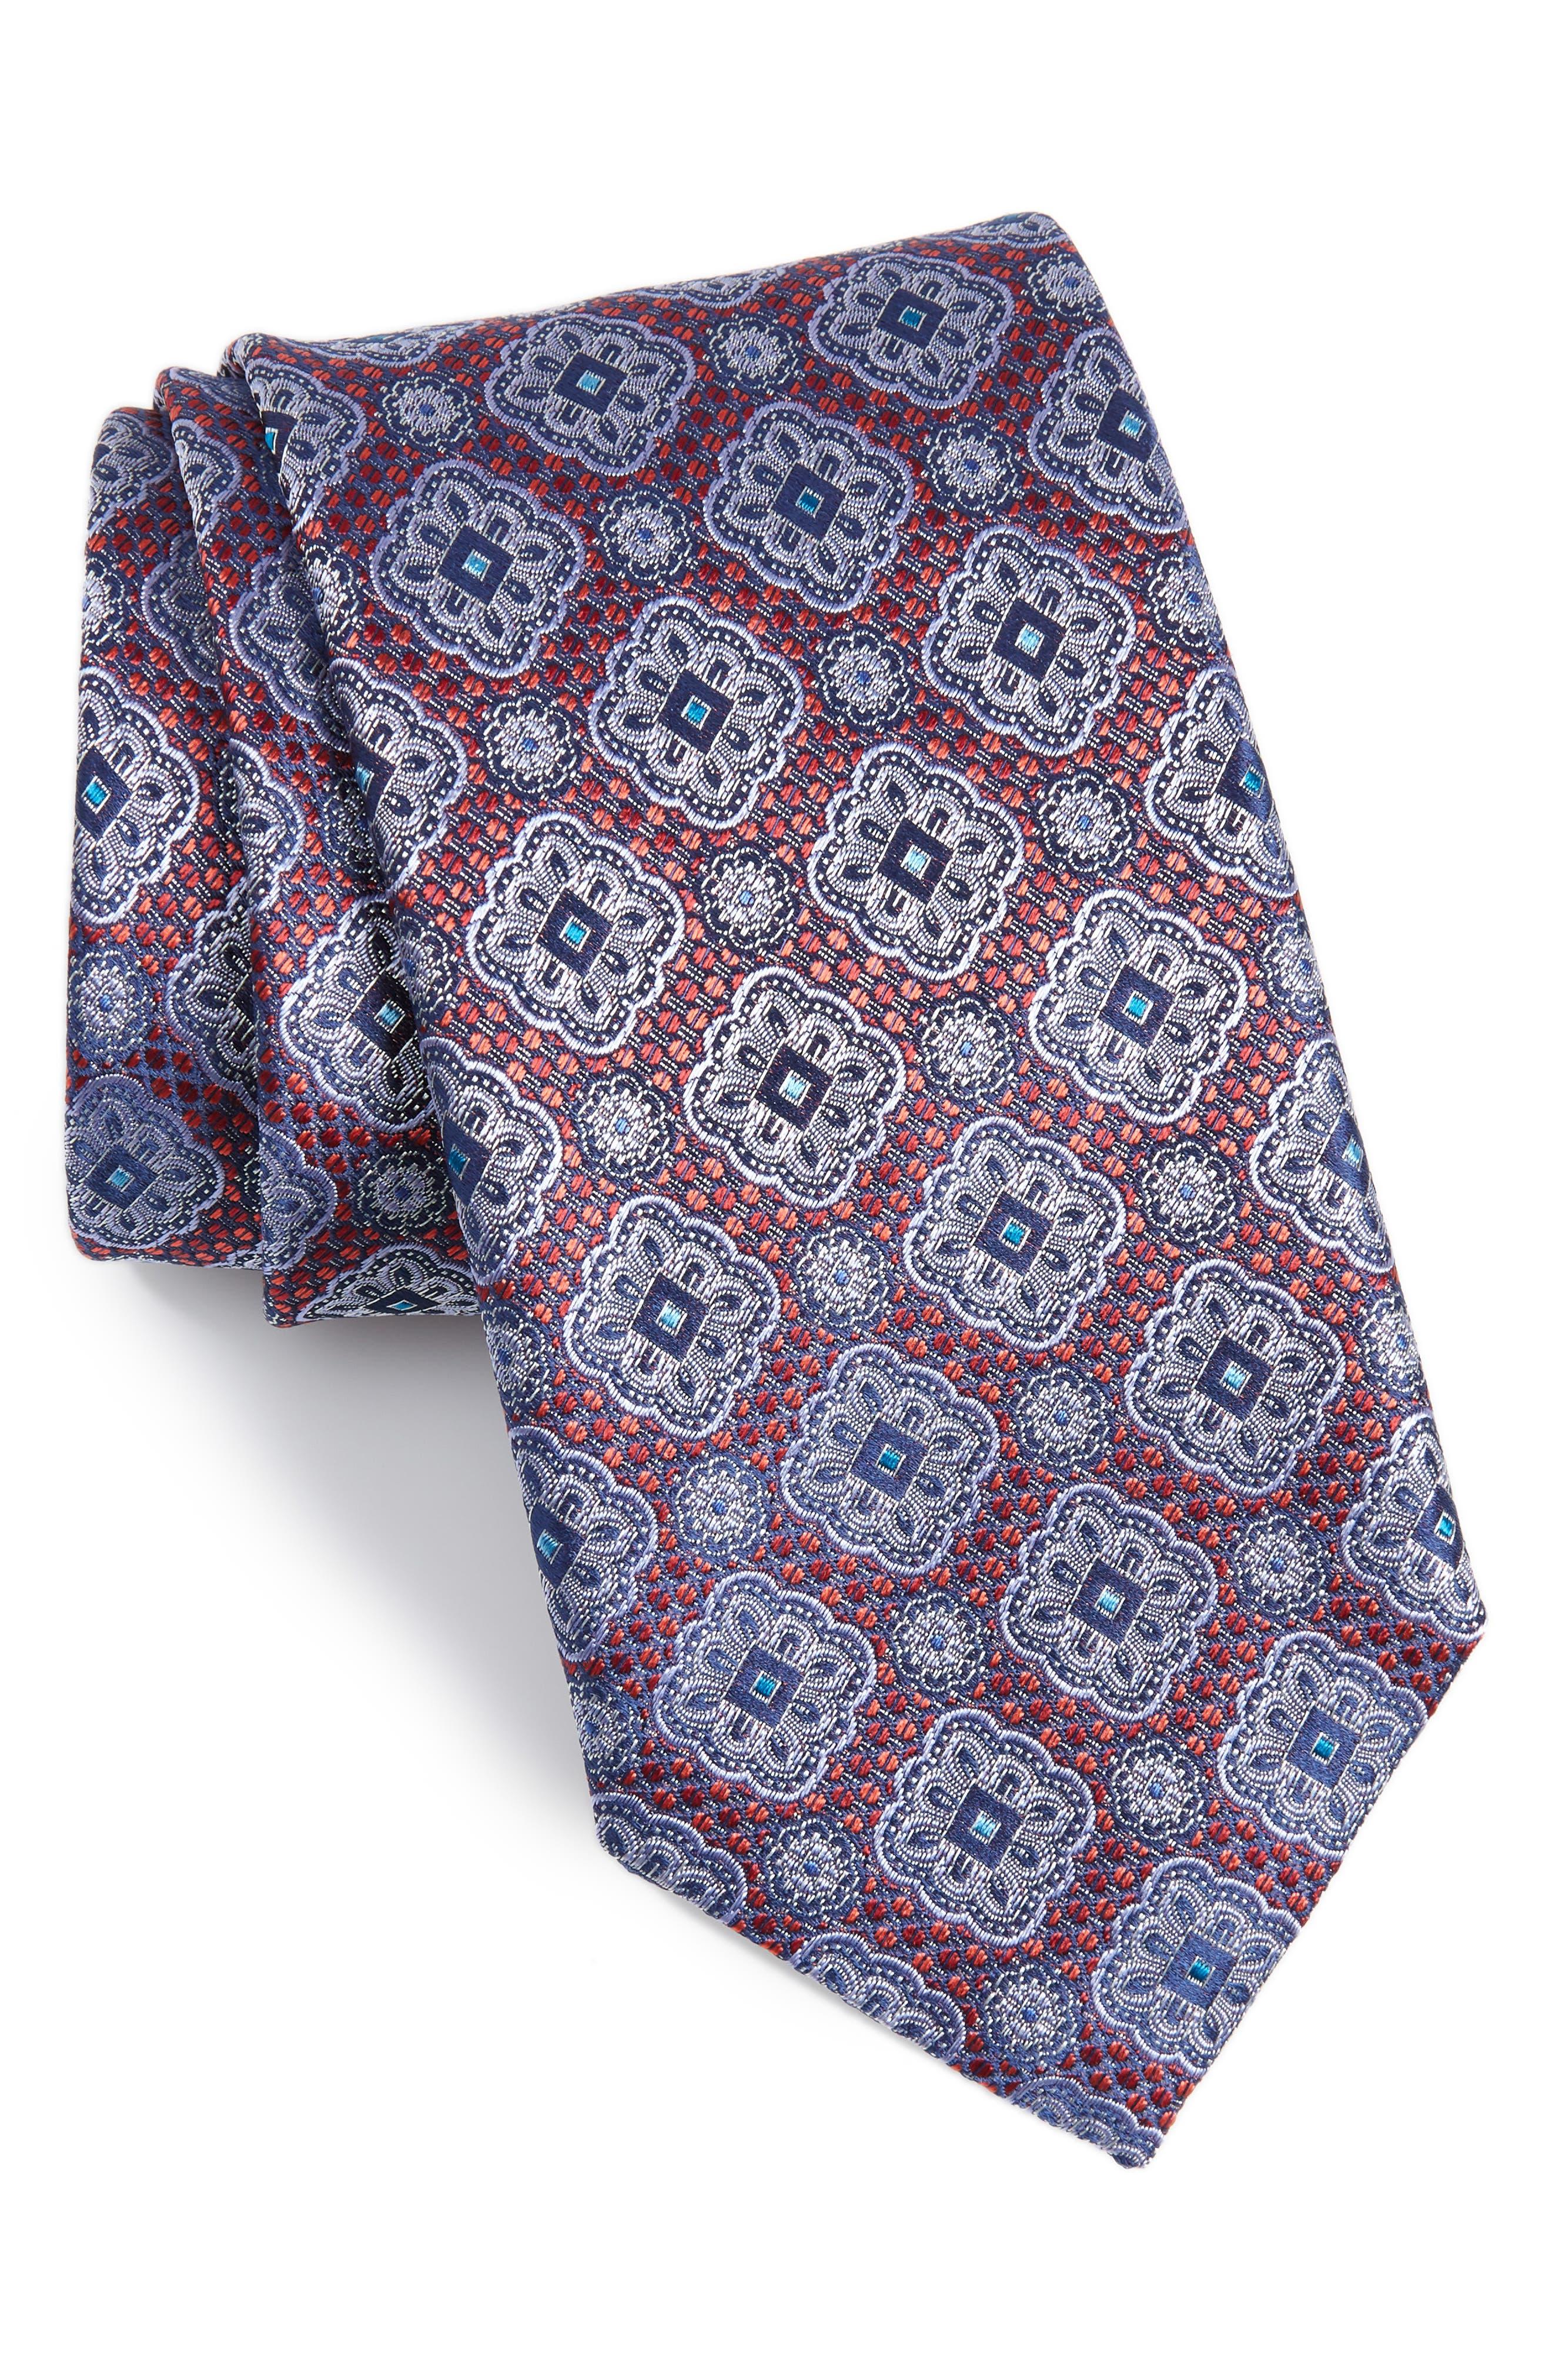 Medallion Silk Tie,                             Main thumbnail 1, color,                             601